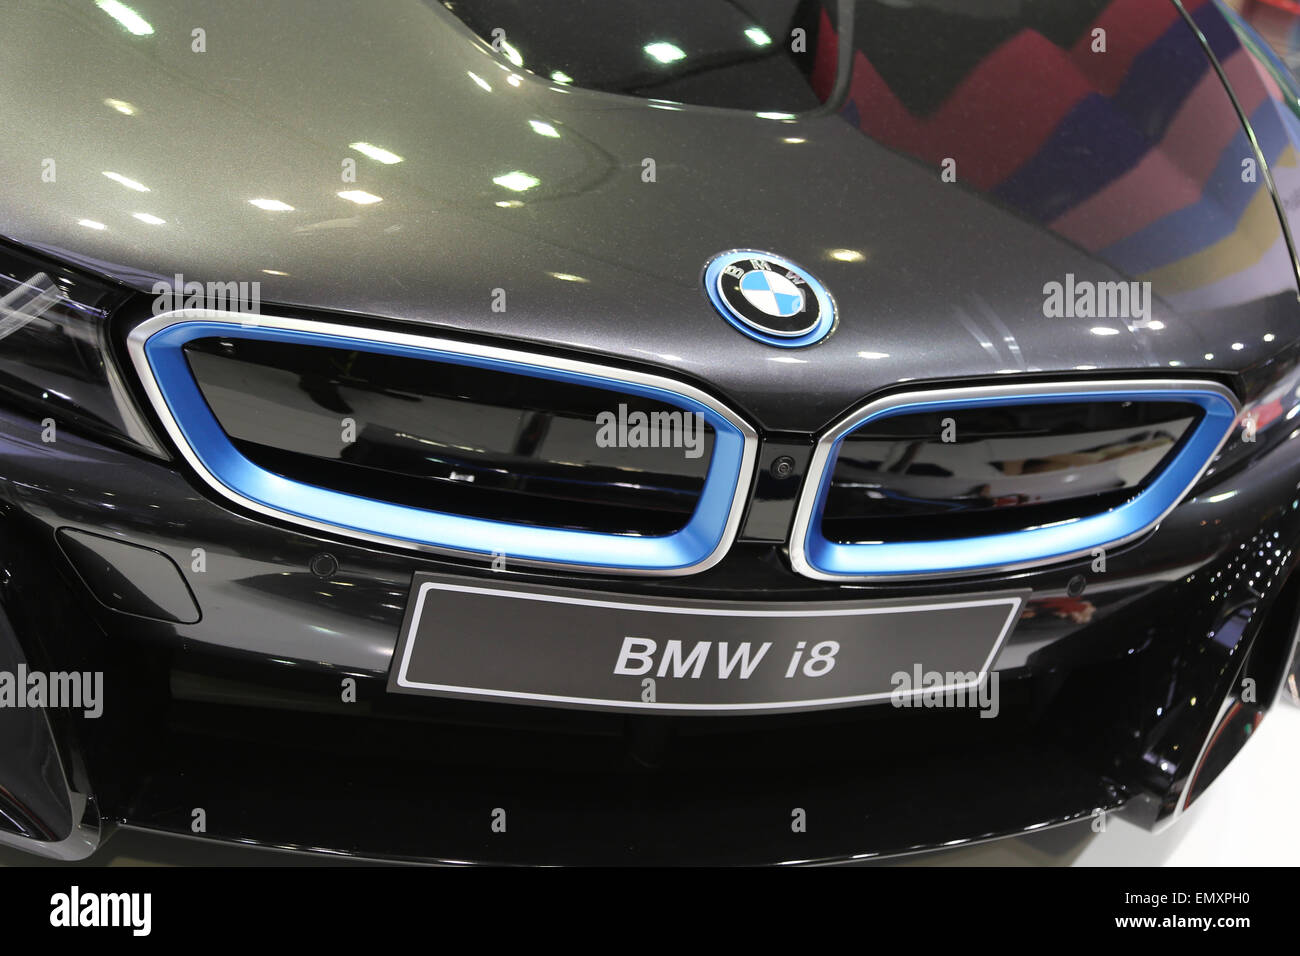 ISTANBUL TURKEY APRIL 05 2015 BMW i8 Fujifilm stand during 6. International Photo Digital Photography fair Istanbul. - Stock Image